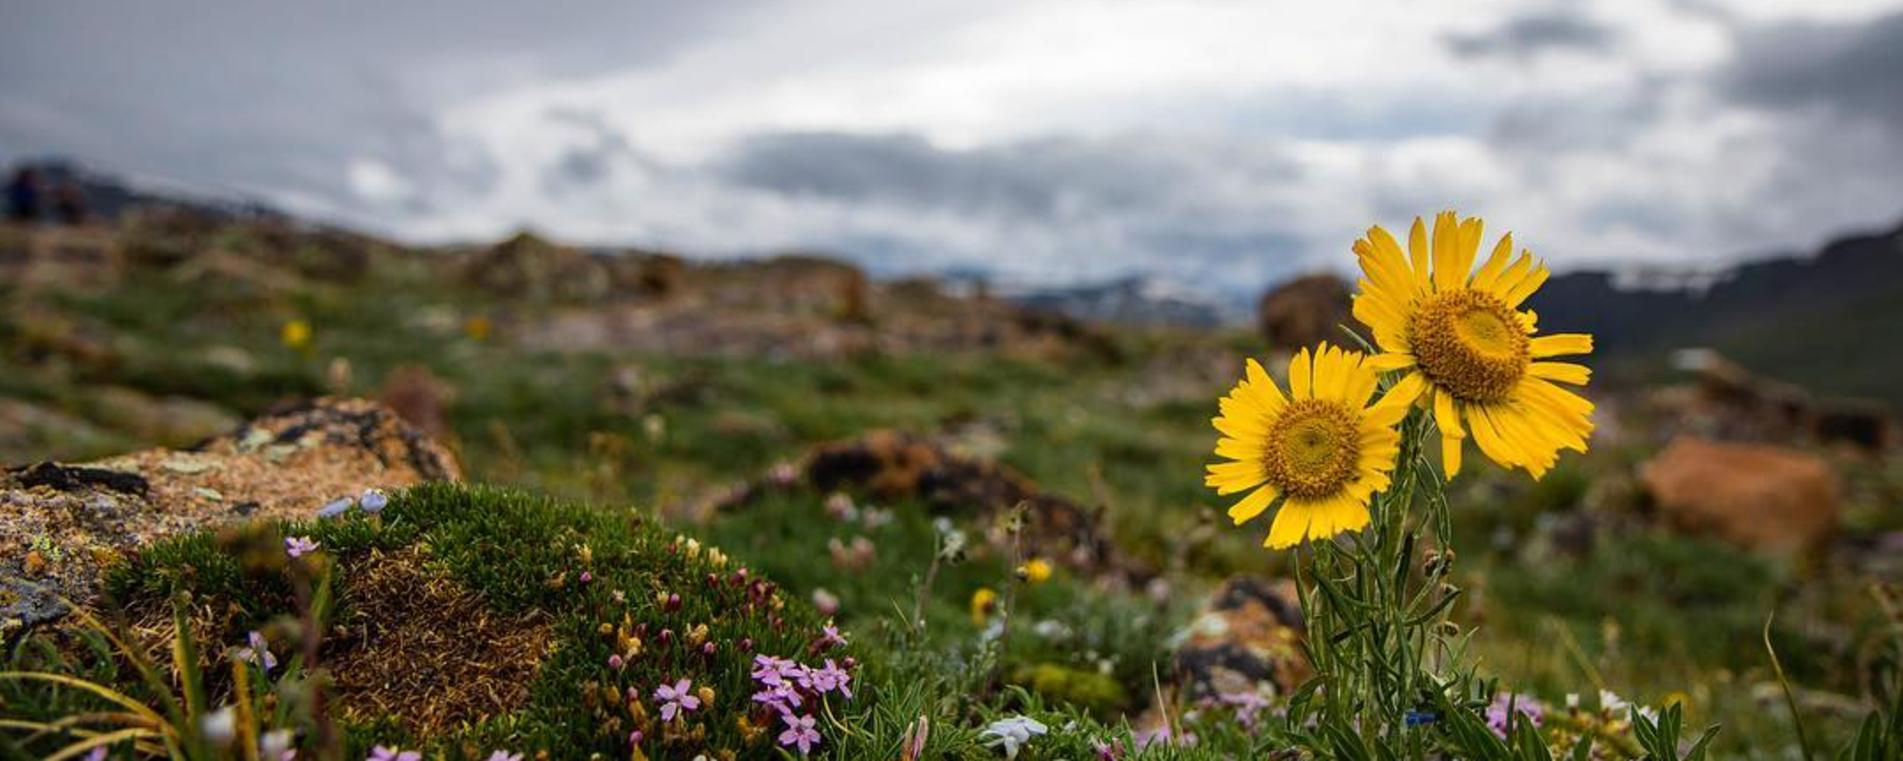 Wildflower Rocky Mountain National Park RMNP